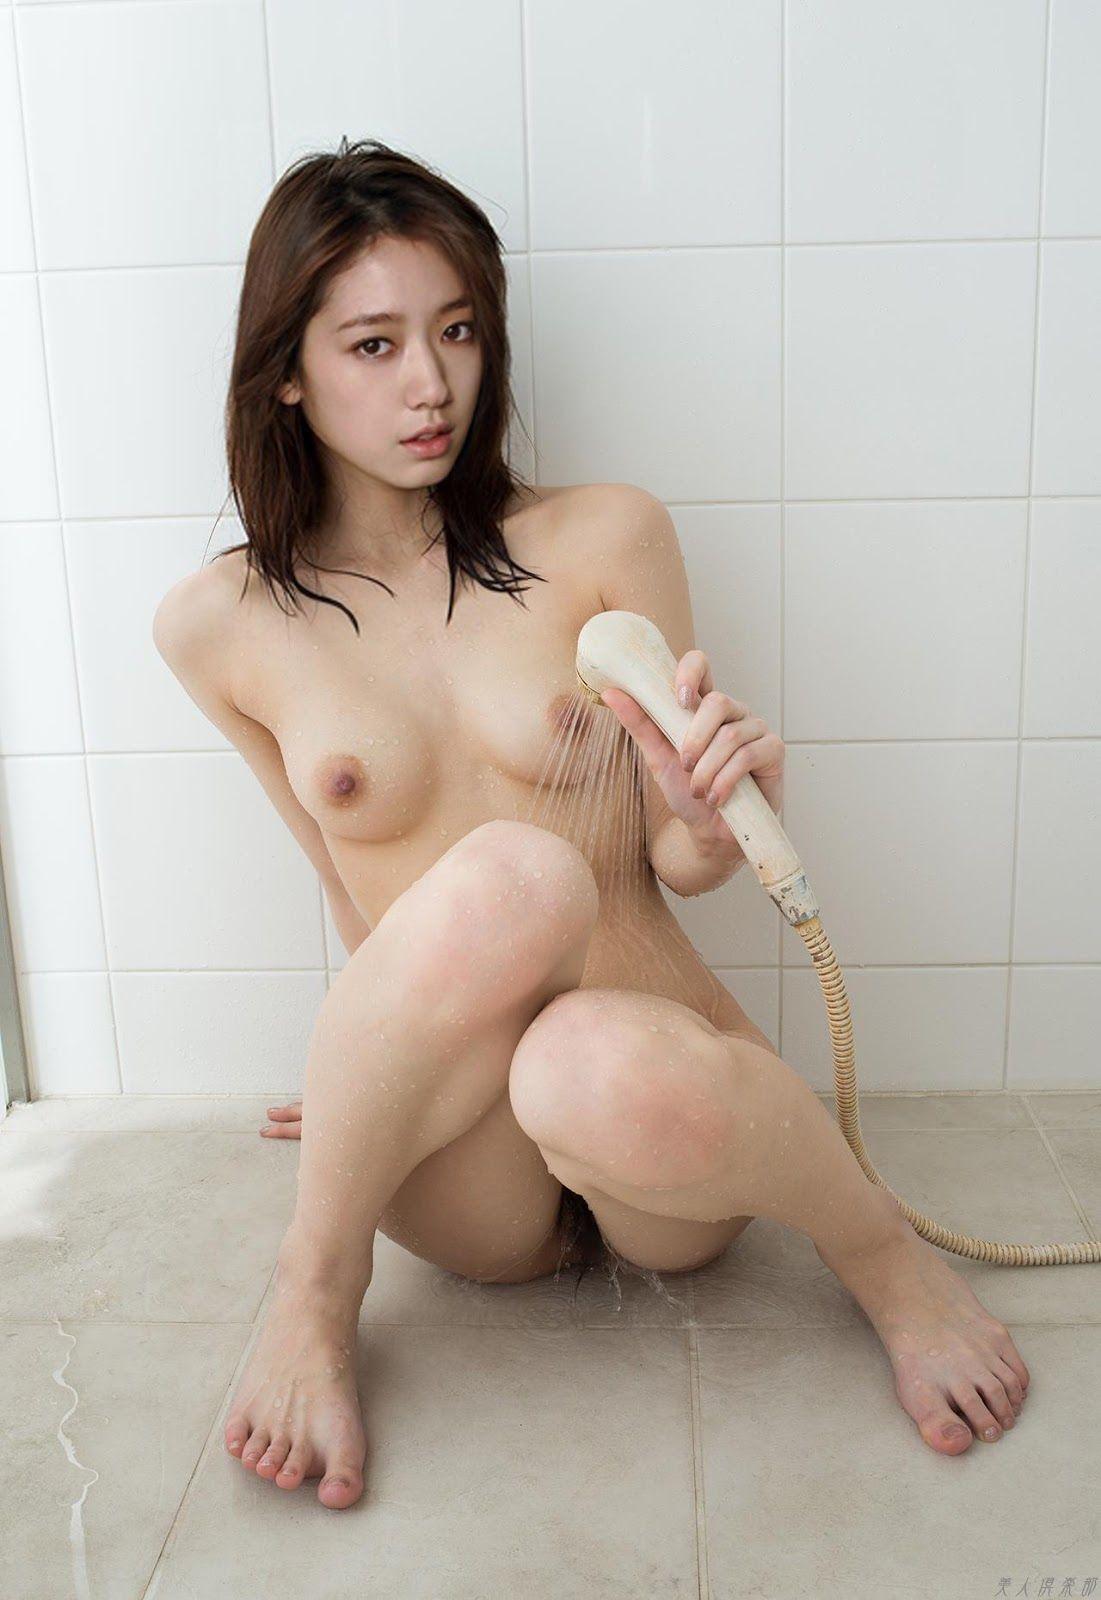 big boob babe pics